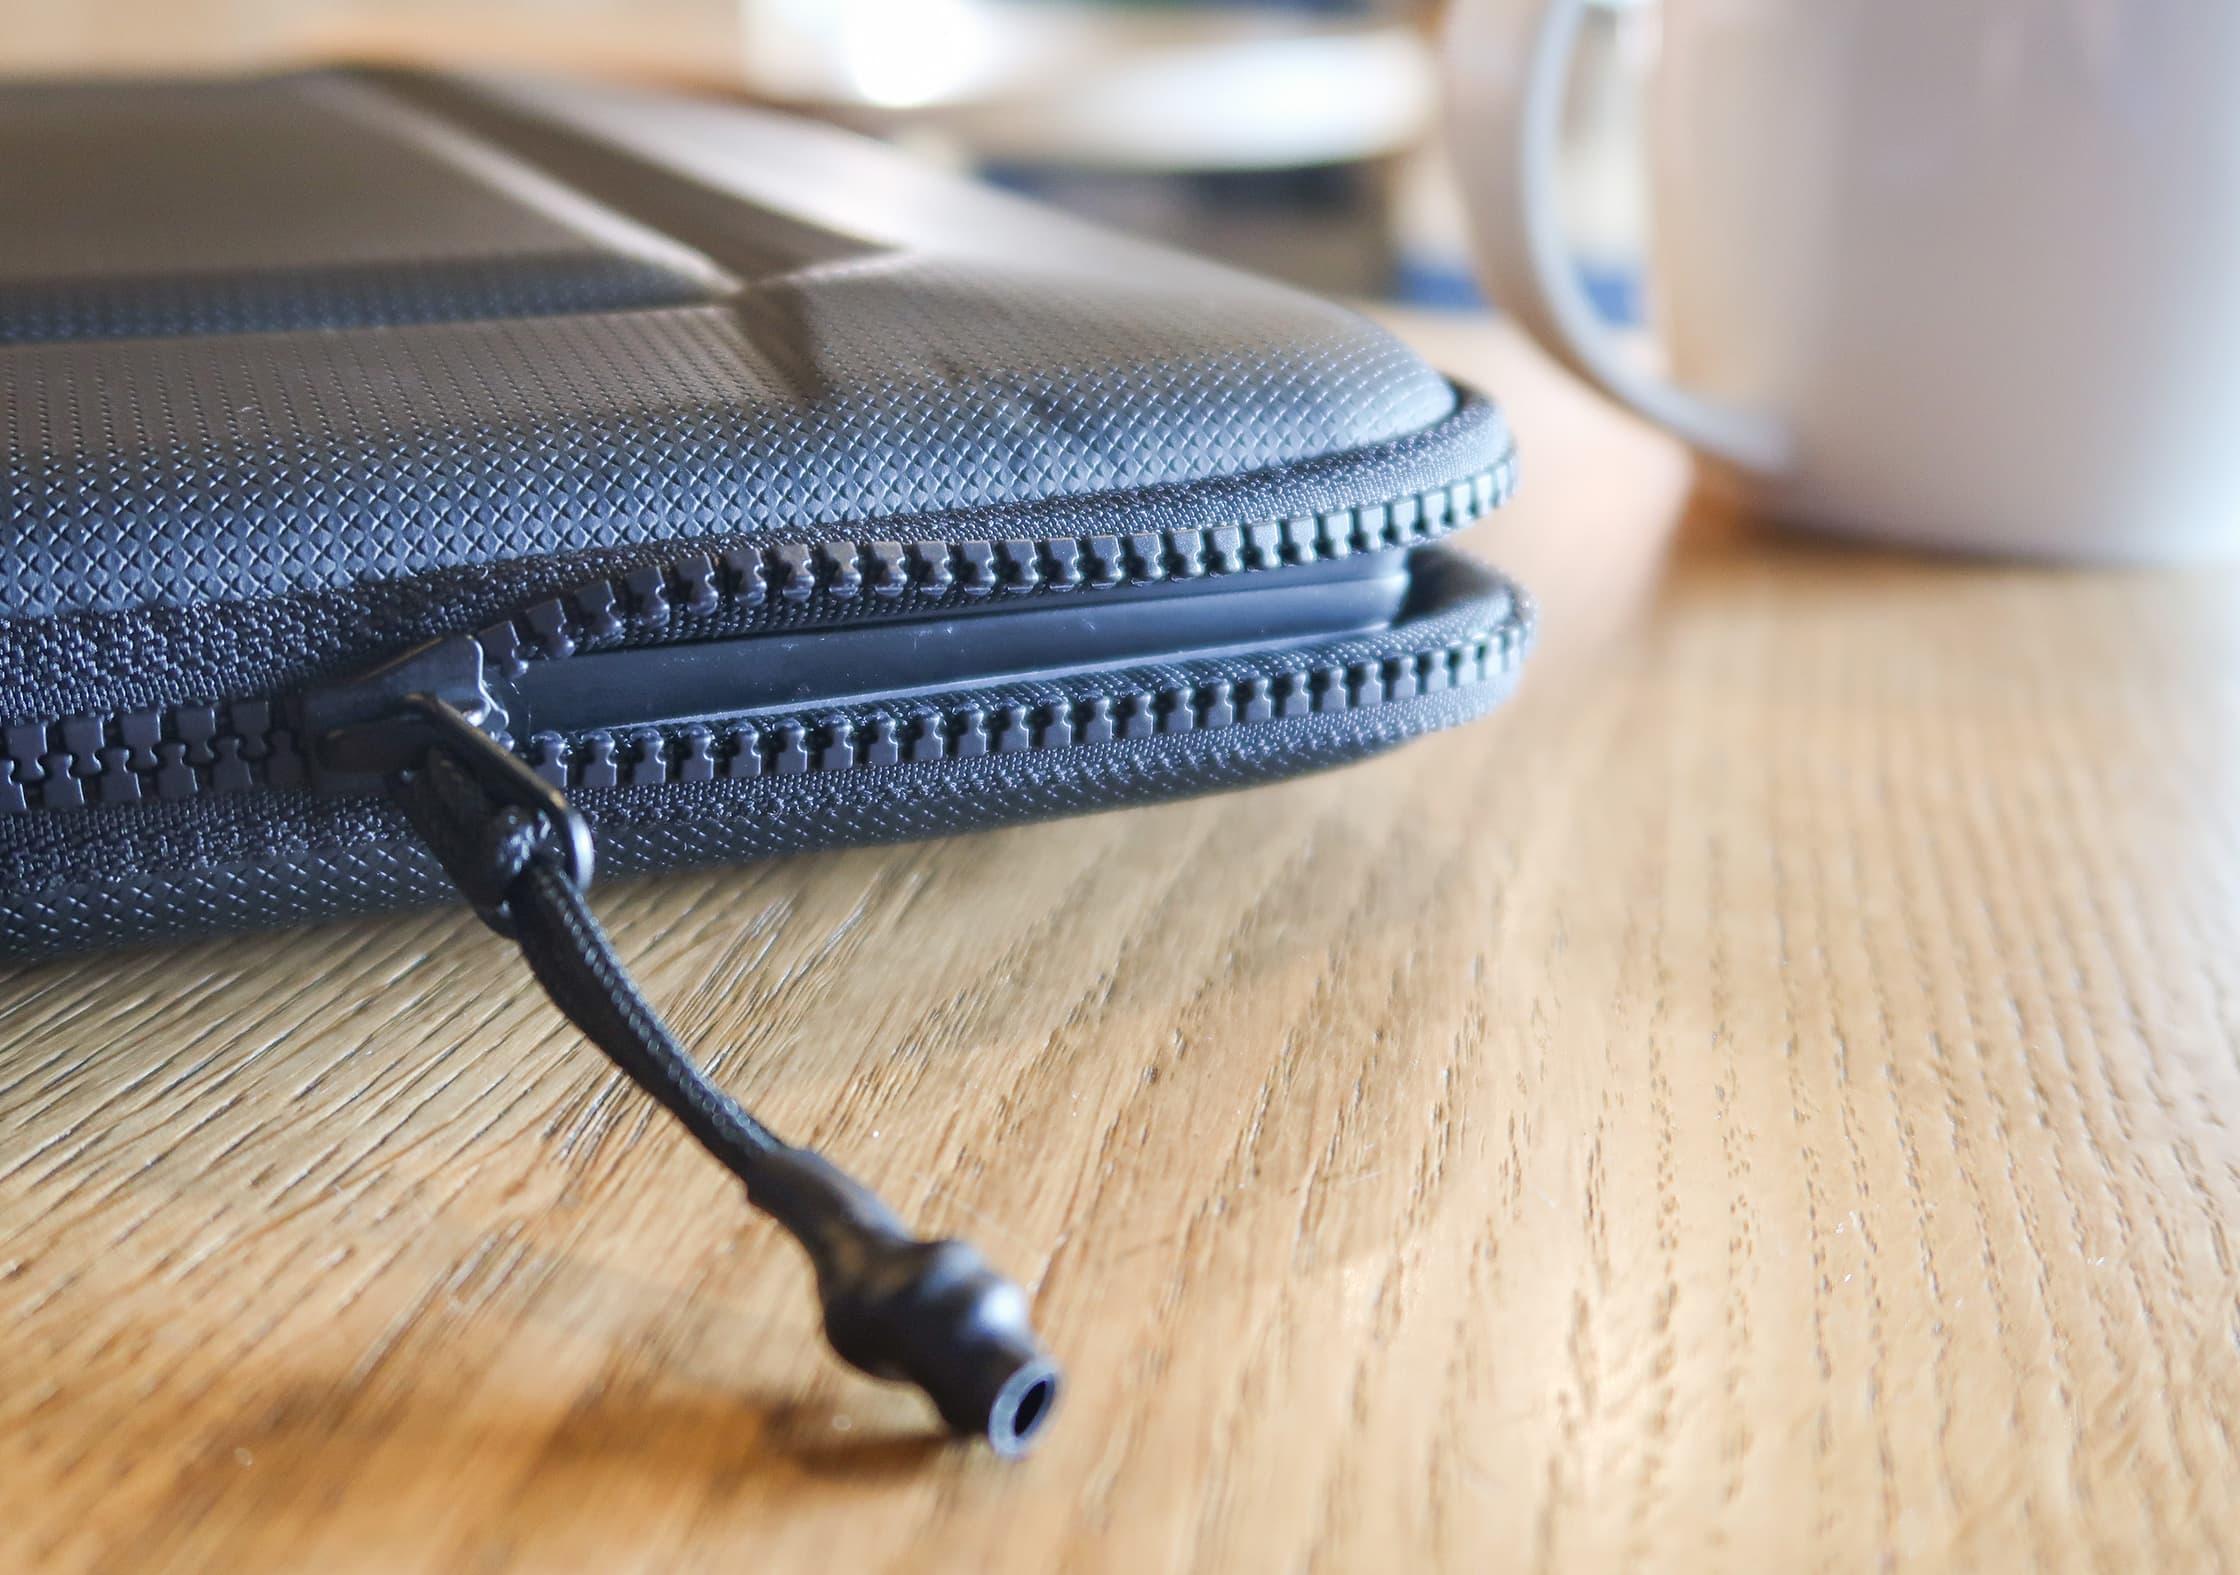 YKK #5 Vislon Zip On The Thule Gauntlet 3.0 Laptop Sleeve